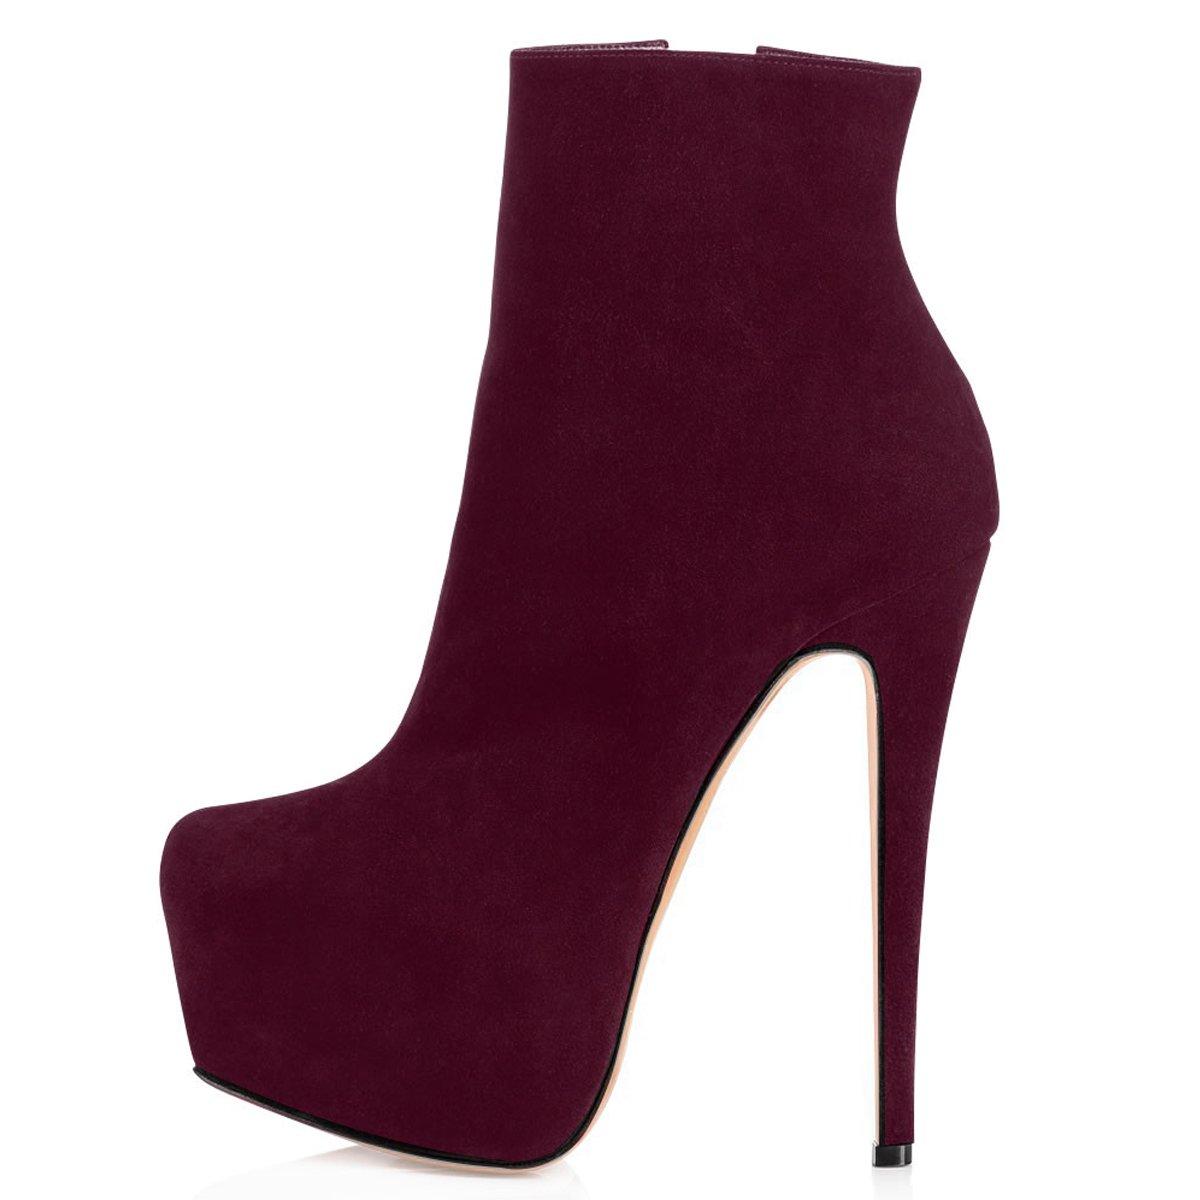 ELASHE Ankle Boots | 15cmTrendige Damen Stiefeletten | Plateau Stiefel mit Absatz43 EU|Bordeaux